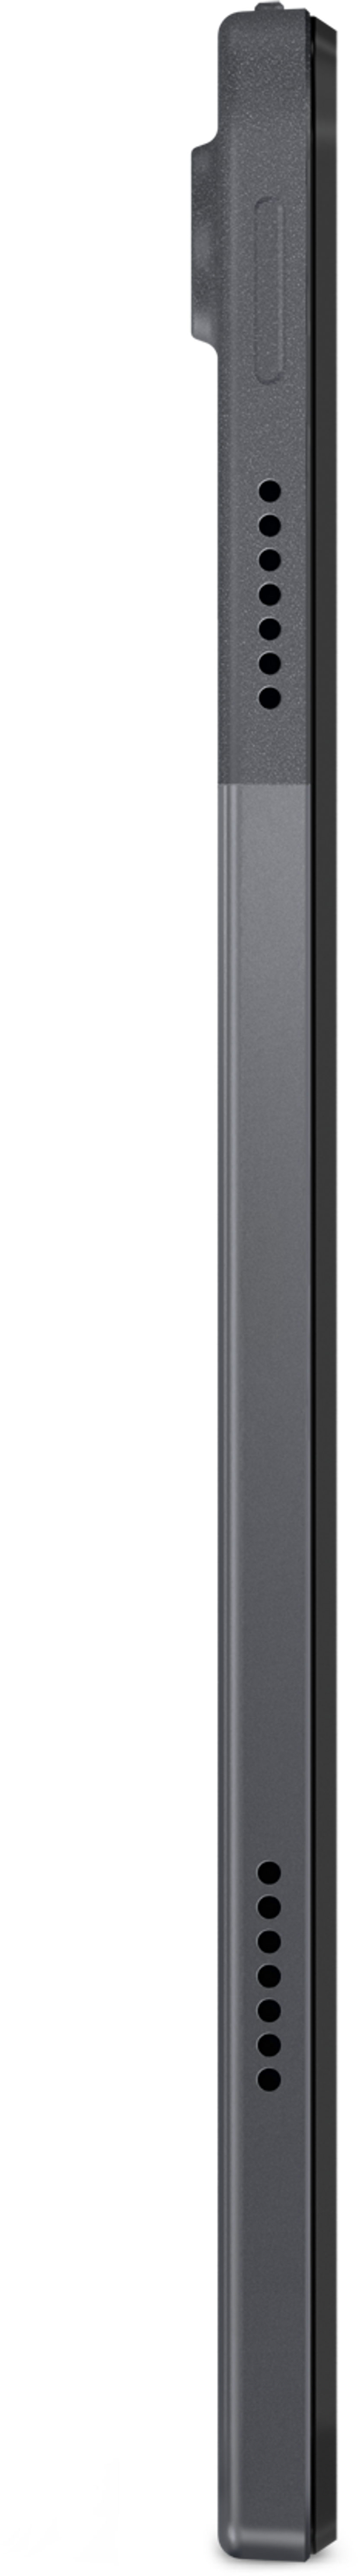 "Lenovo Tab P11 ZA7S 11"" Snapdragon 662 64GB 4GB Skiffergrå"